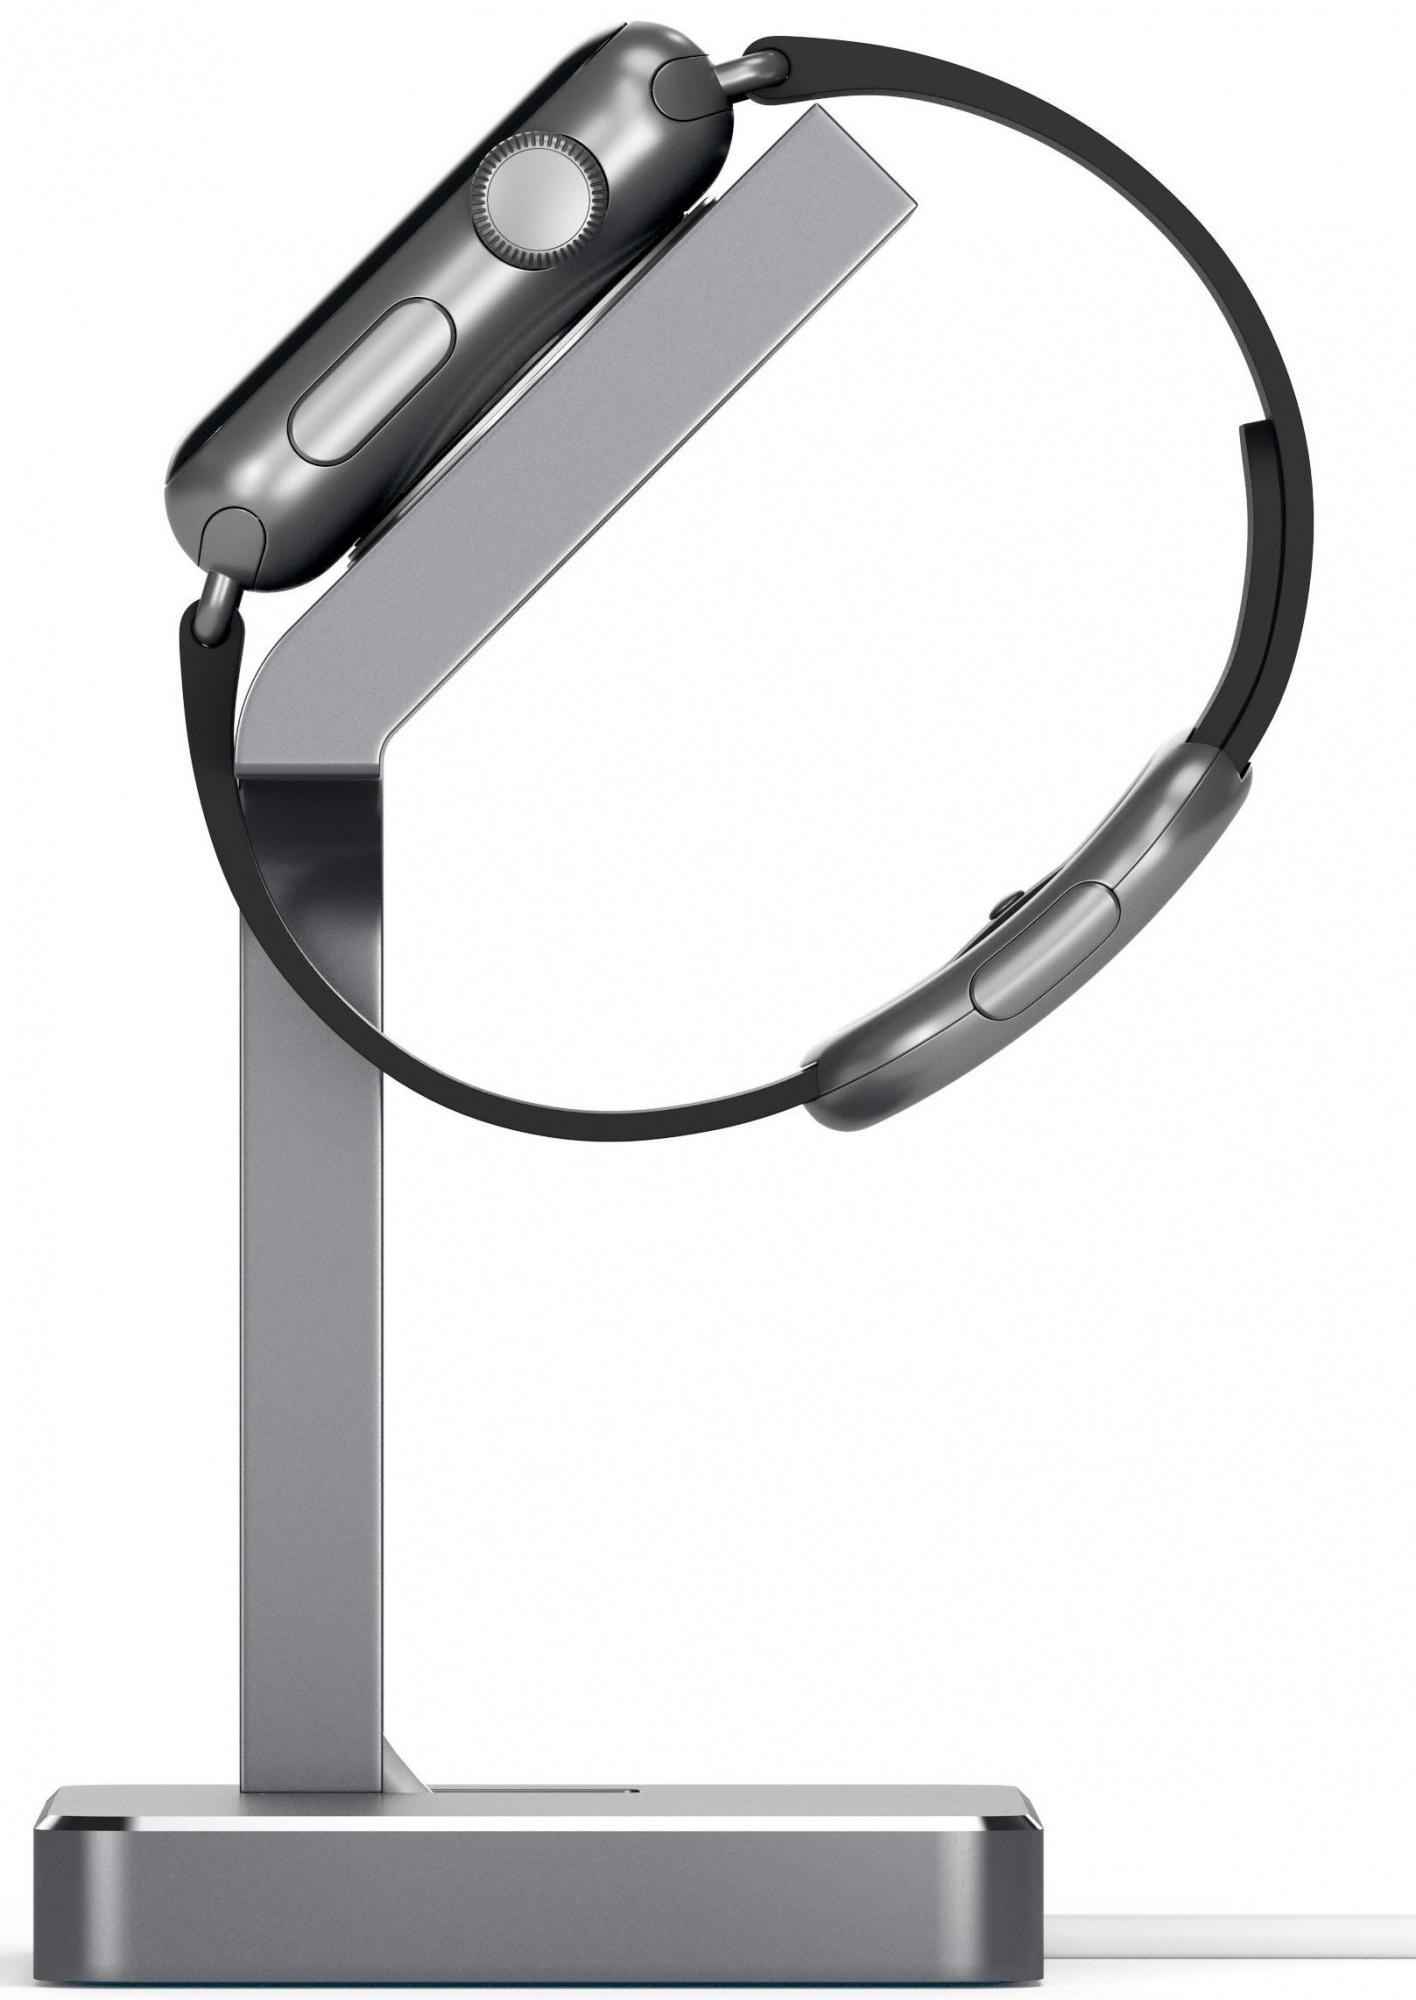 Подставка Satechi Aluminum Apple Watch Charging Stand (ST-AWSM) для Apple Watch/Series 2/3 38/42mm (Space Grey)